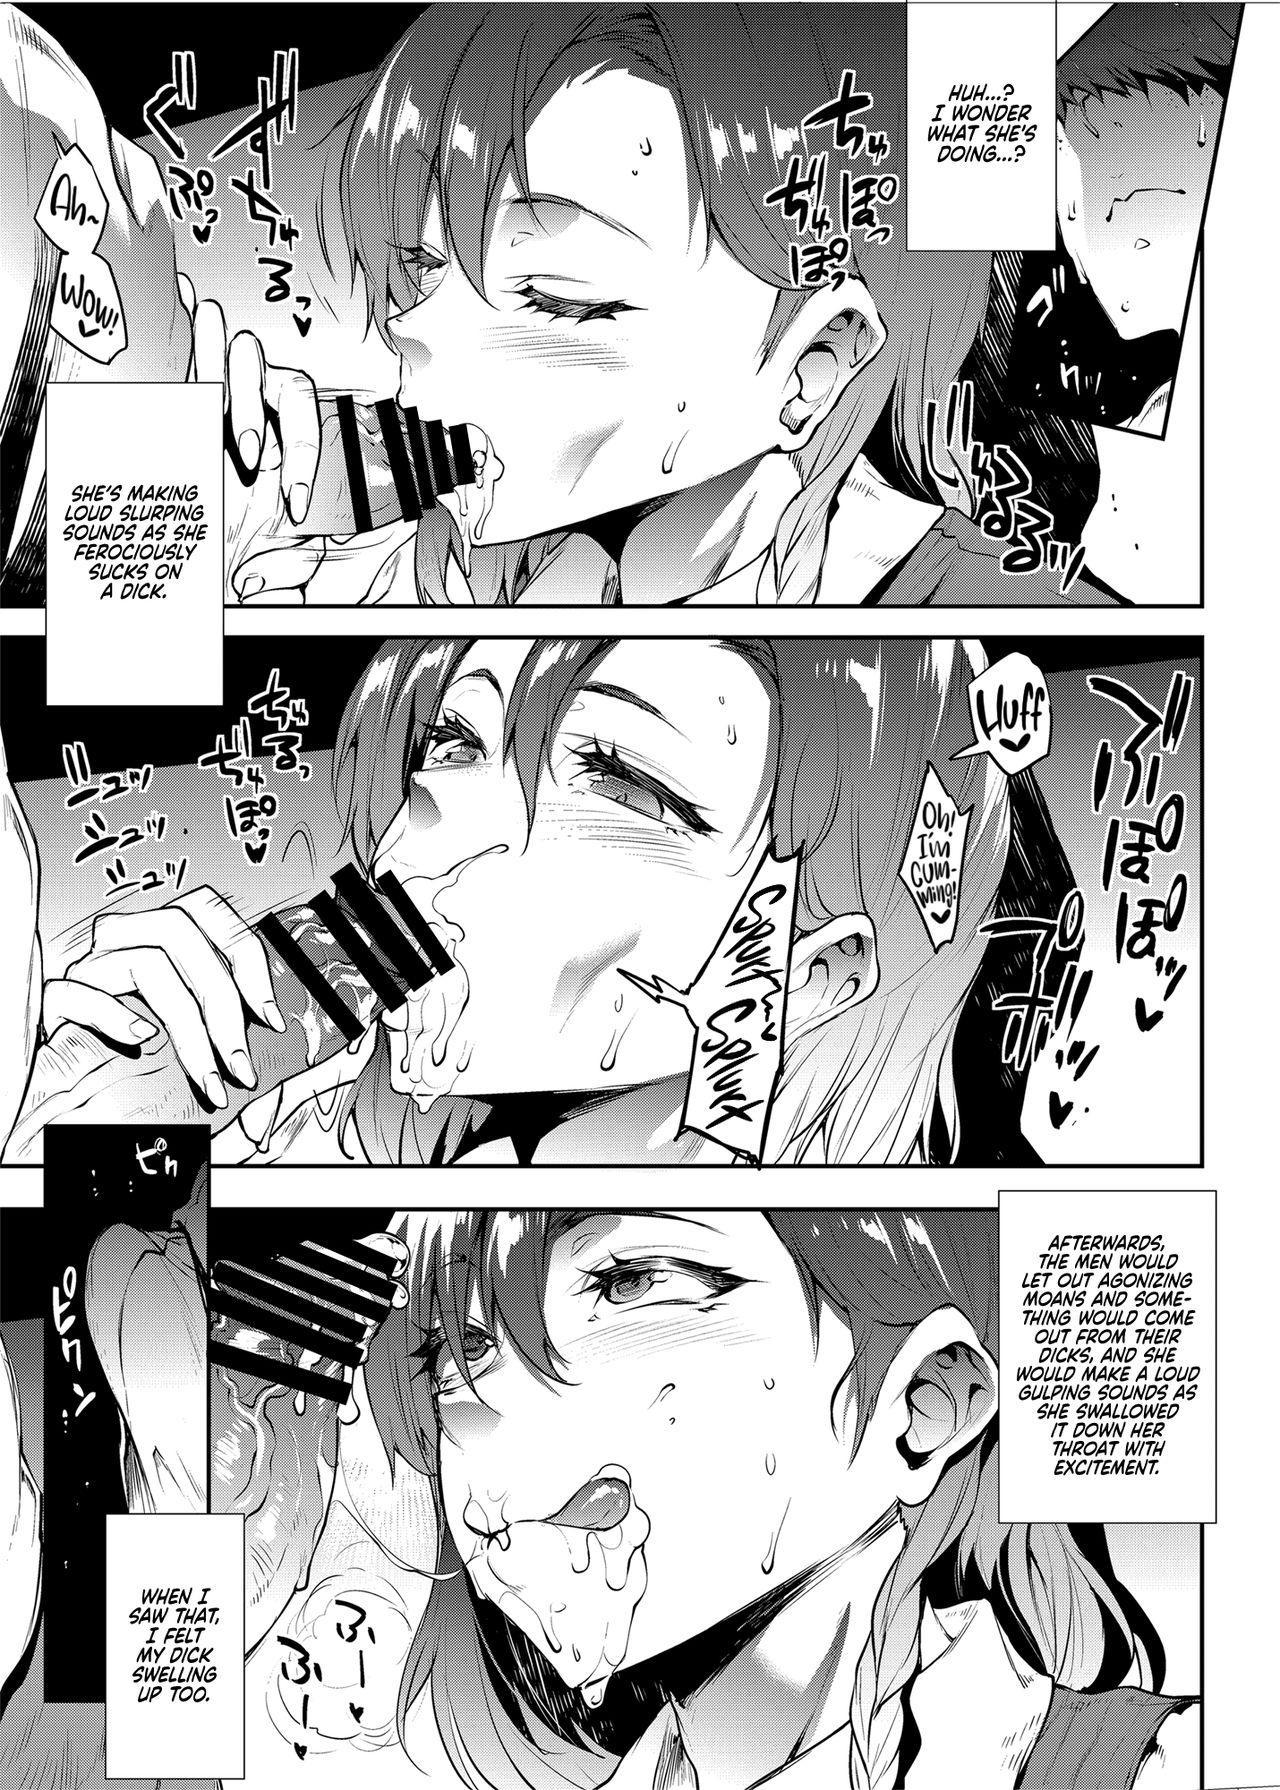 [ERECT TOUCH (Erect Sawaru)] Flower Vendor ~Hanauri Onee-san ni Yasashiku Fudeoroshi~ | Flower Vendor ~Gently Losing My Virginity To Miss Flower Vendor~ [English] [RedLantern] 12